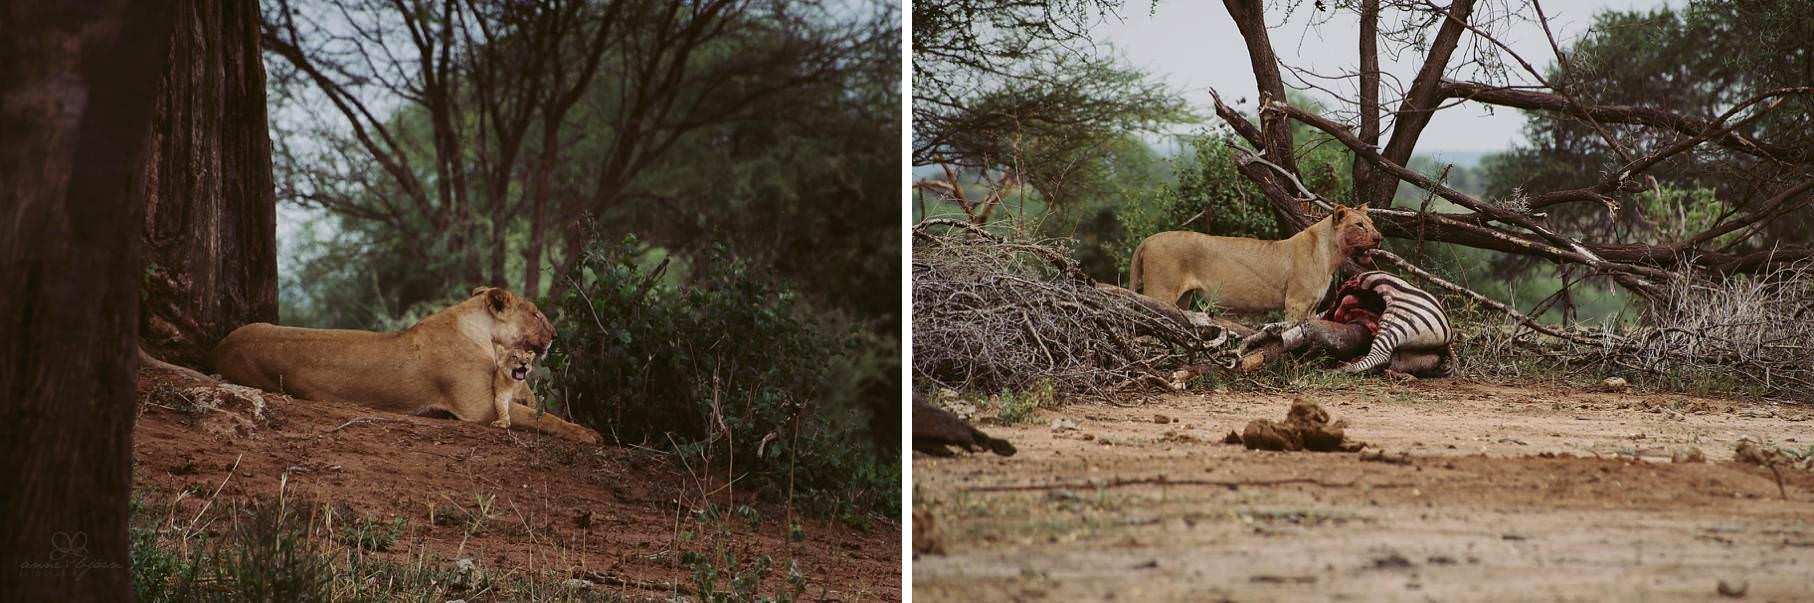 0082 tansania nd8 2828 anne bjoern fotografie hochzeitsfotograf hamburg - This is Tanzania - Serengeti, Kilimanjaro & Sansibar